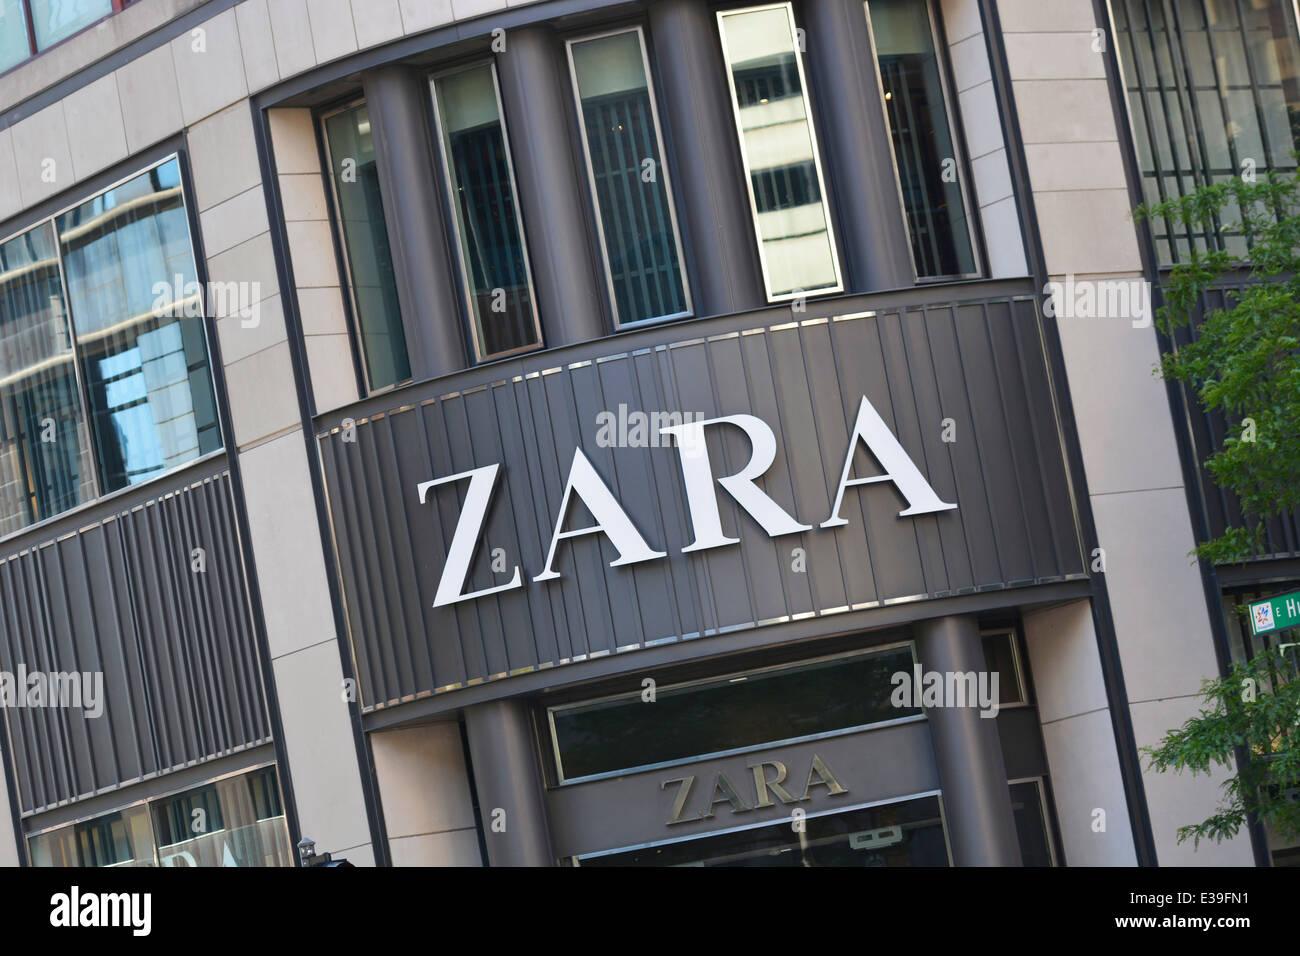 zara store shop entrance sign logo stock photo royalty free image 70895357 alamy. Black Bedroom Furniture Sets. Home Design Ideas